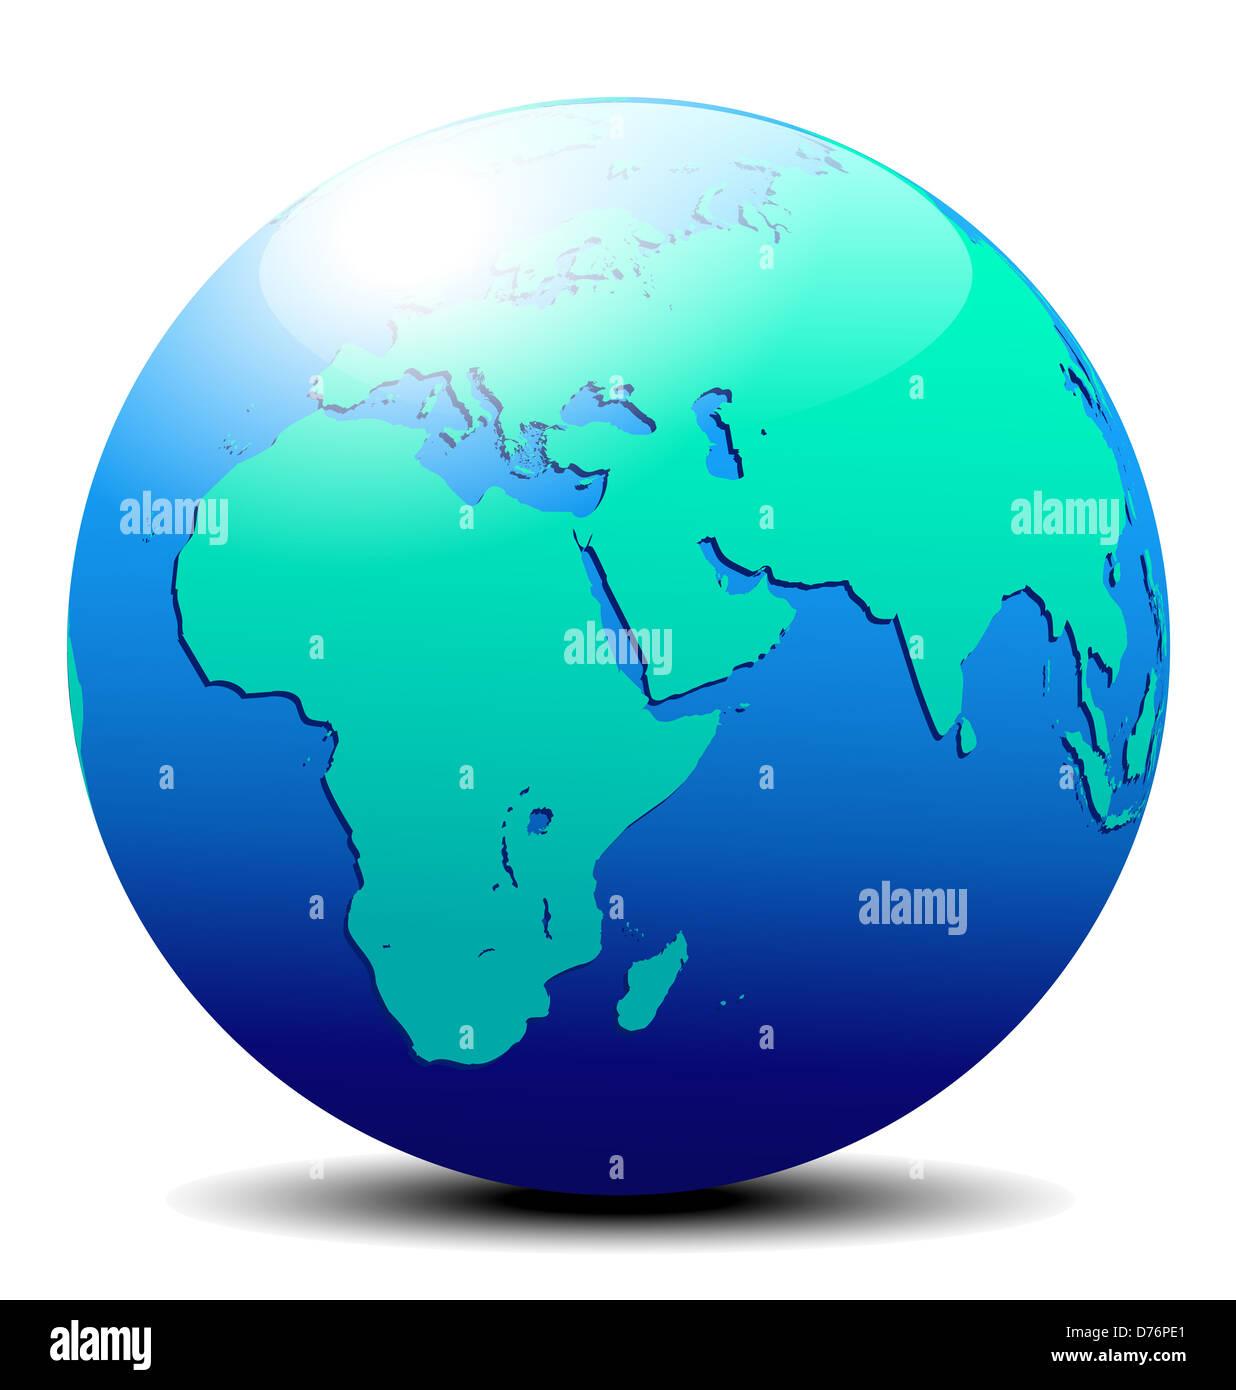 Africa, Arabia and India Global World Earth - Stock Image